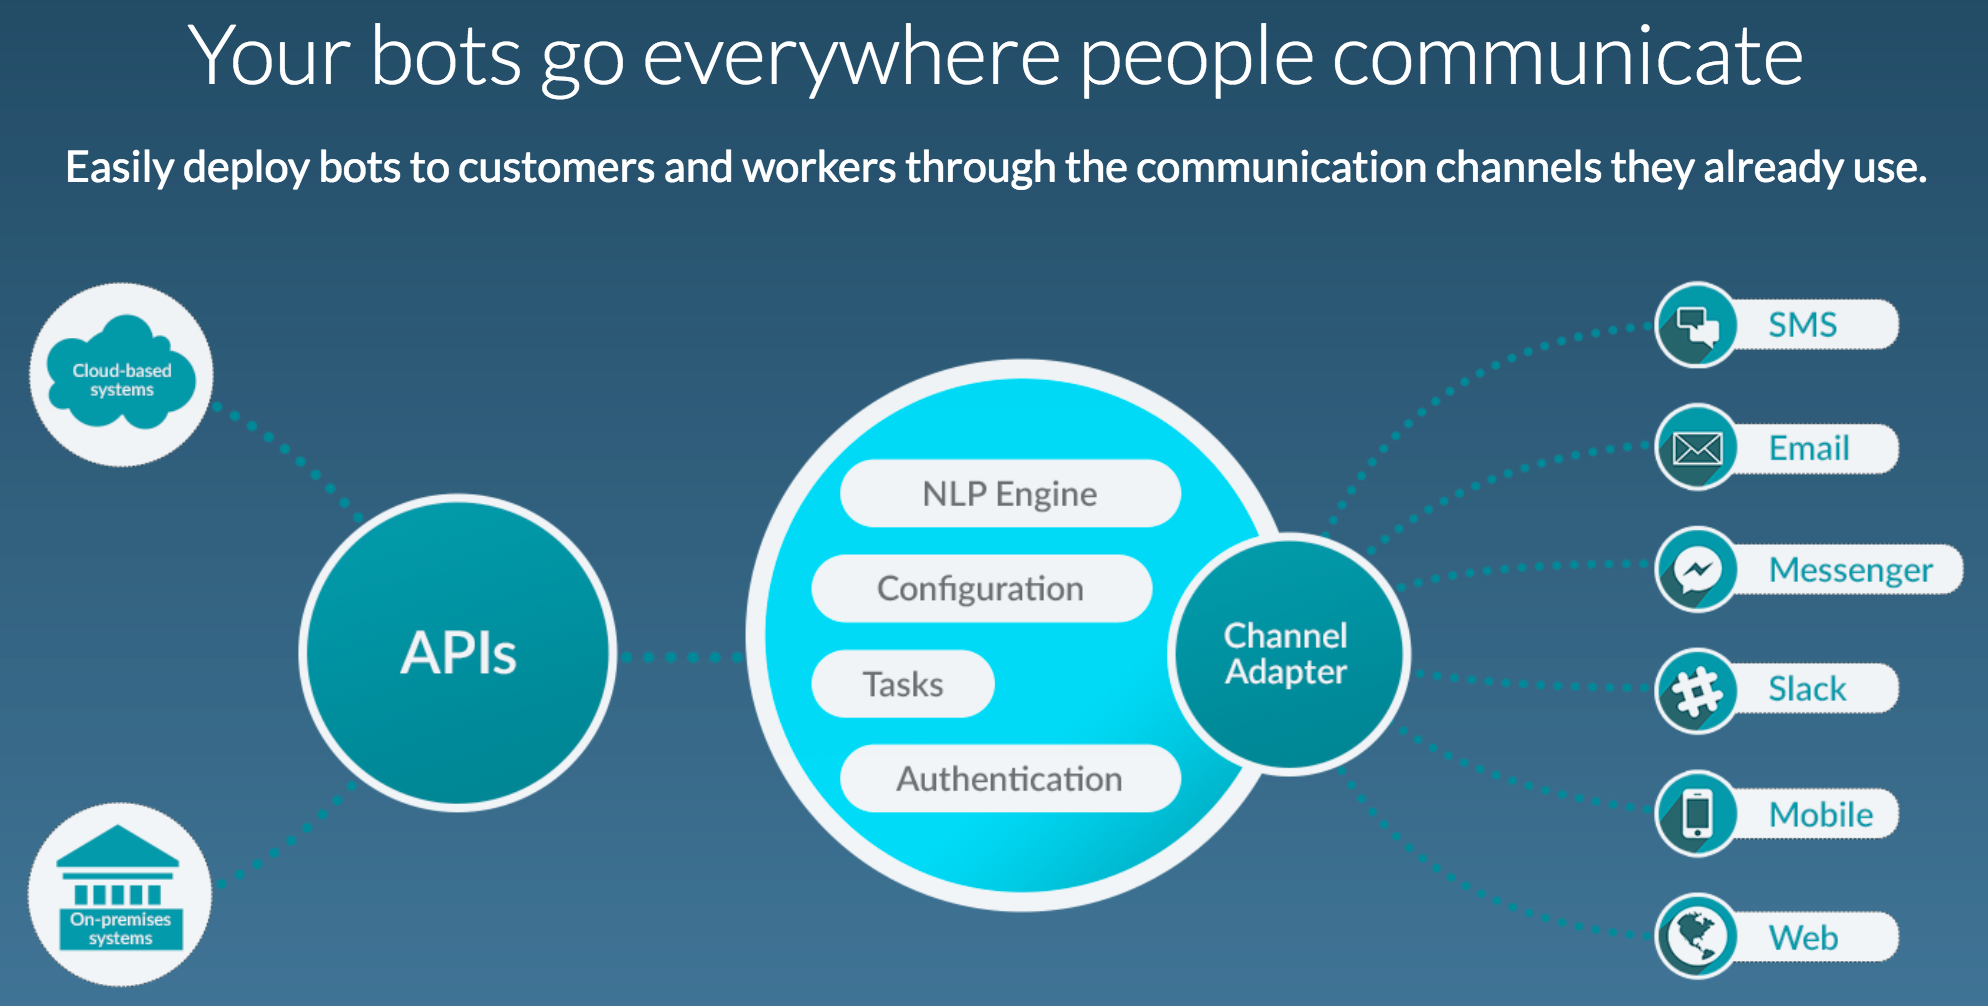 bots_platform_-_drive_customer_engagement_with_intelligent_bots___kore